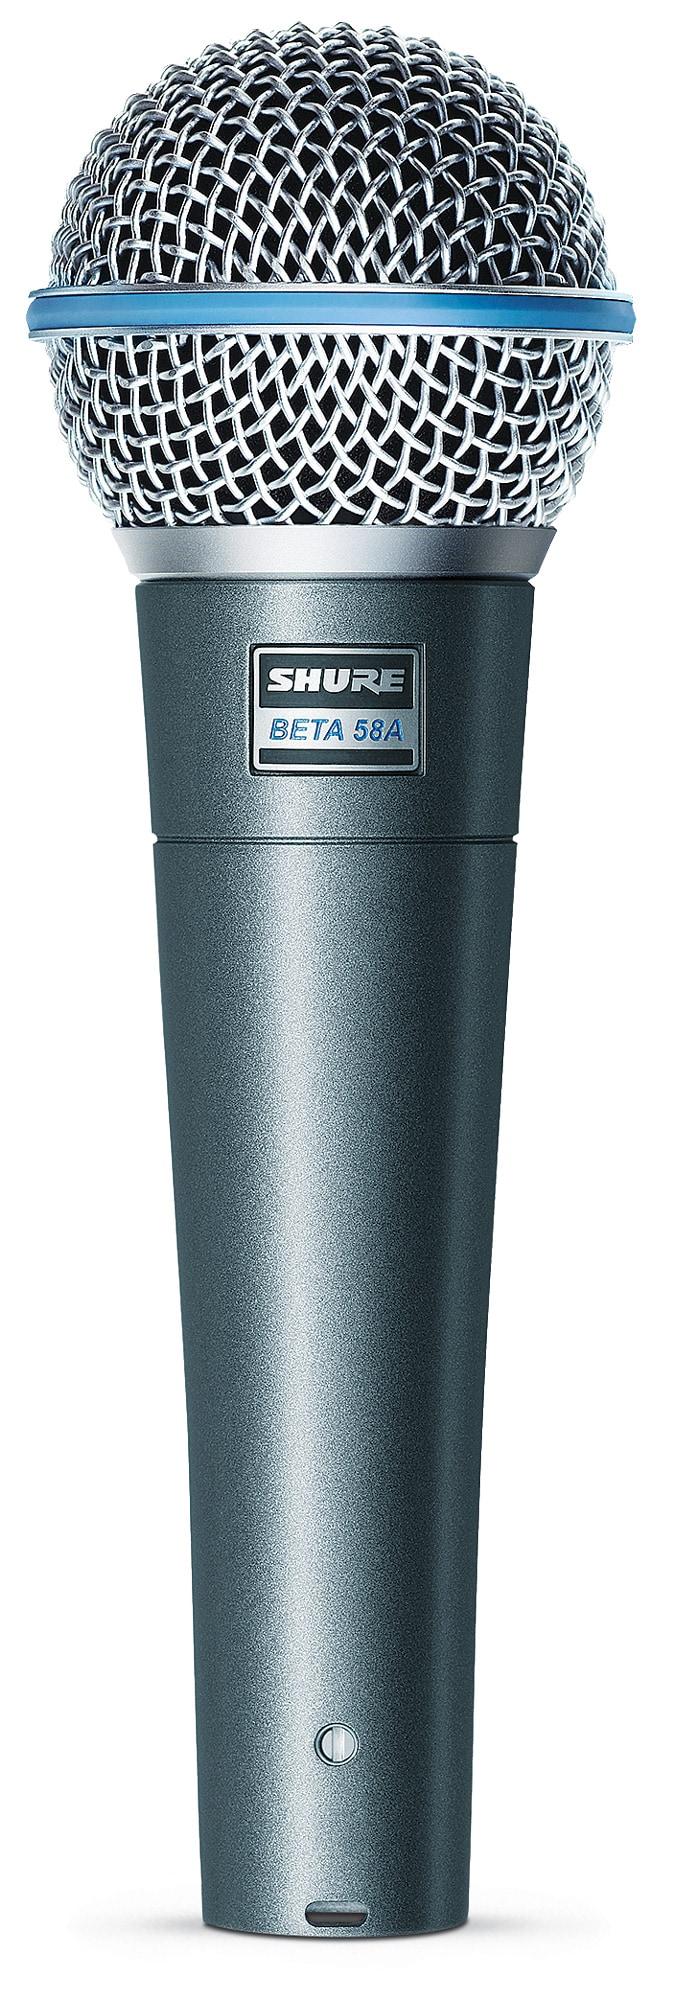 Mikrofone - Shure Beta 58A - Onlineshop Musikhaus Kirstein